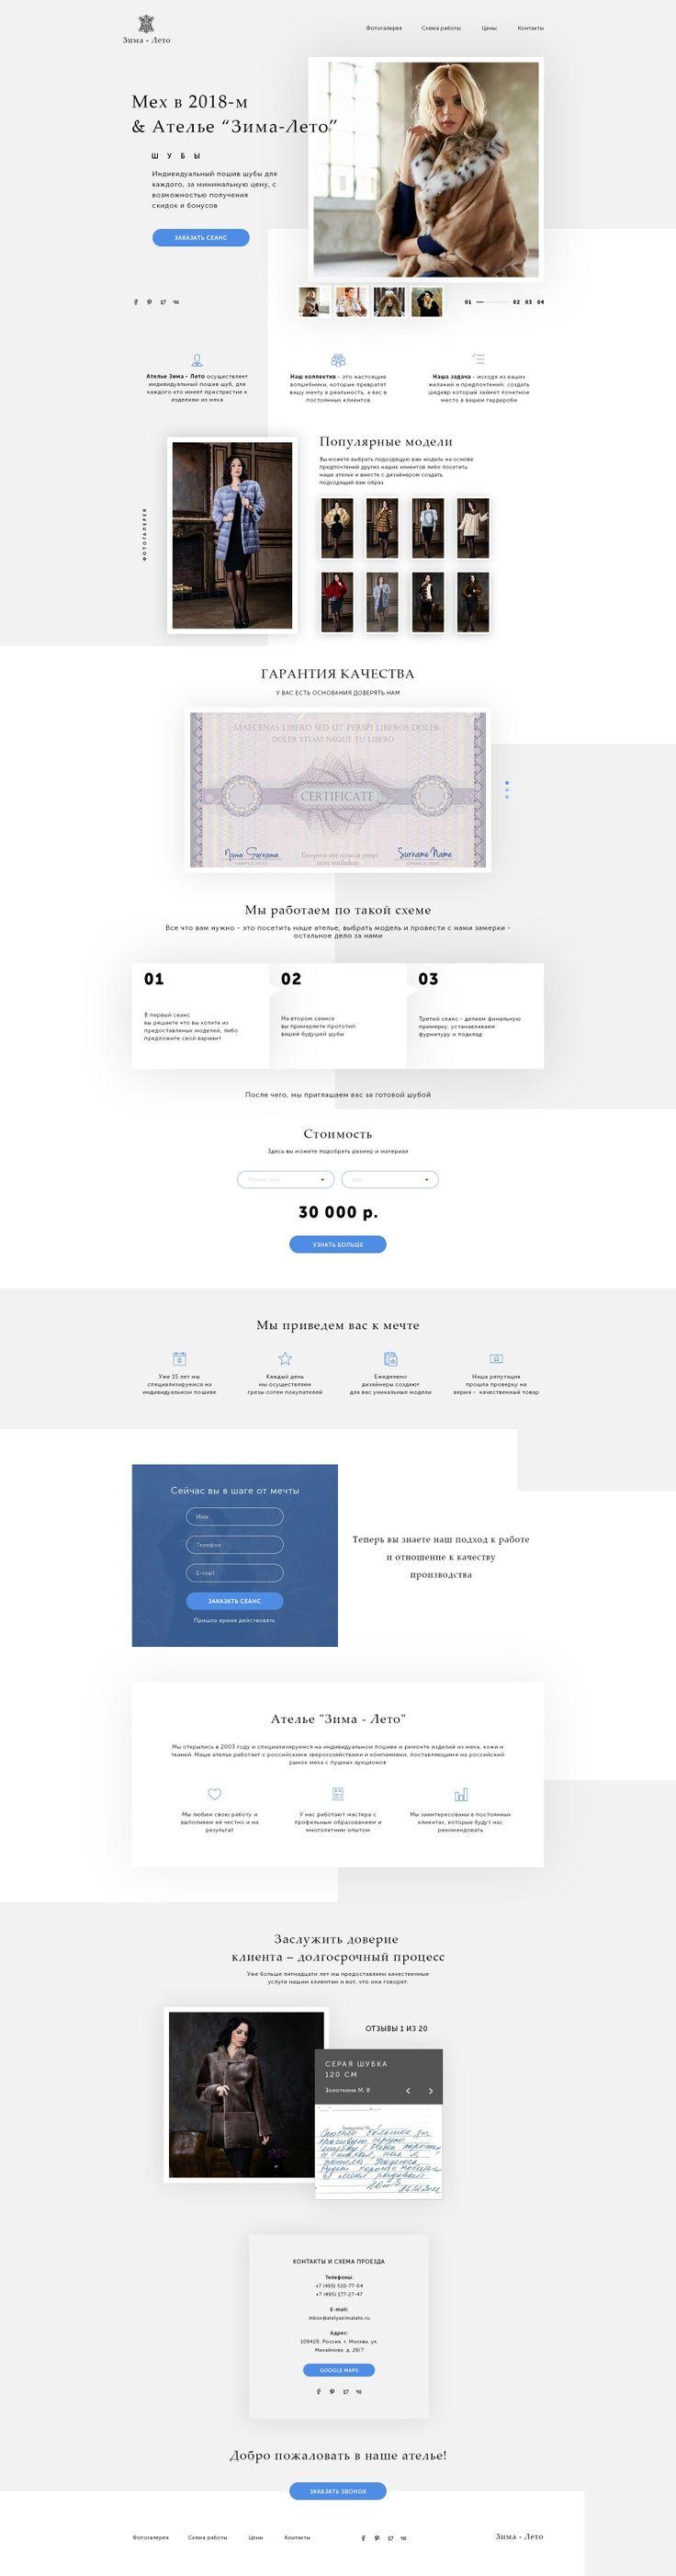 Freelance Web Design & Web Developers by Bohdan Orlov 15$